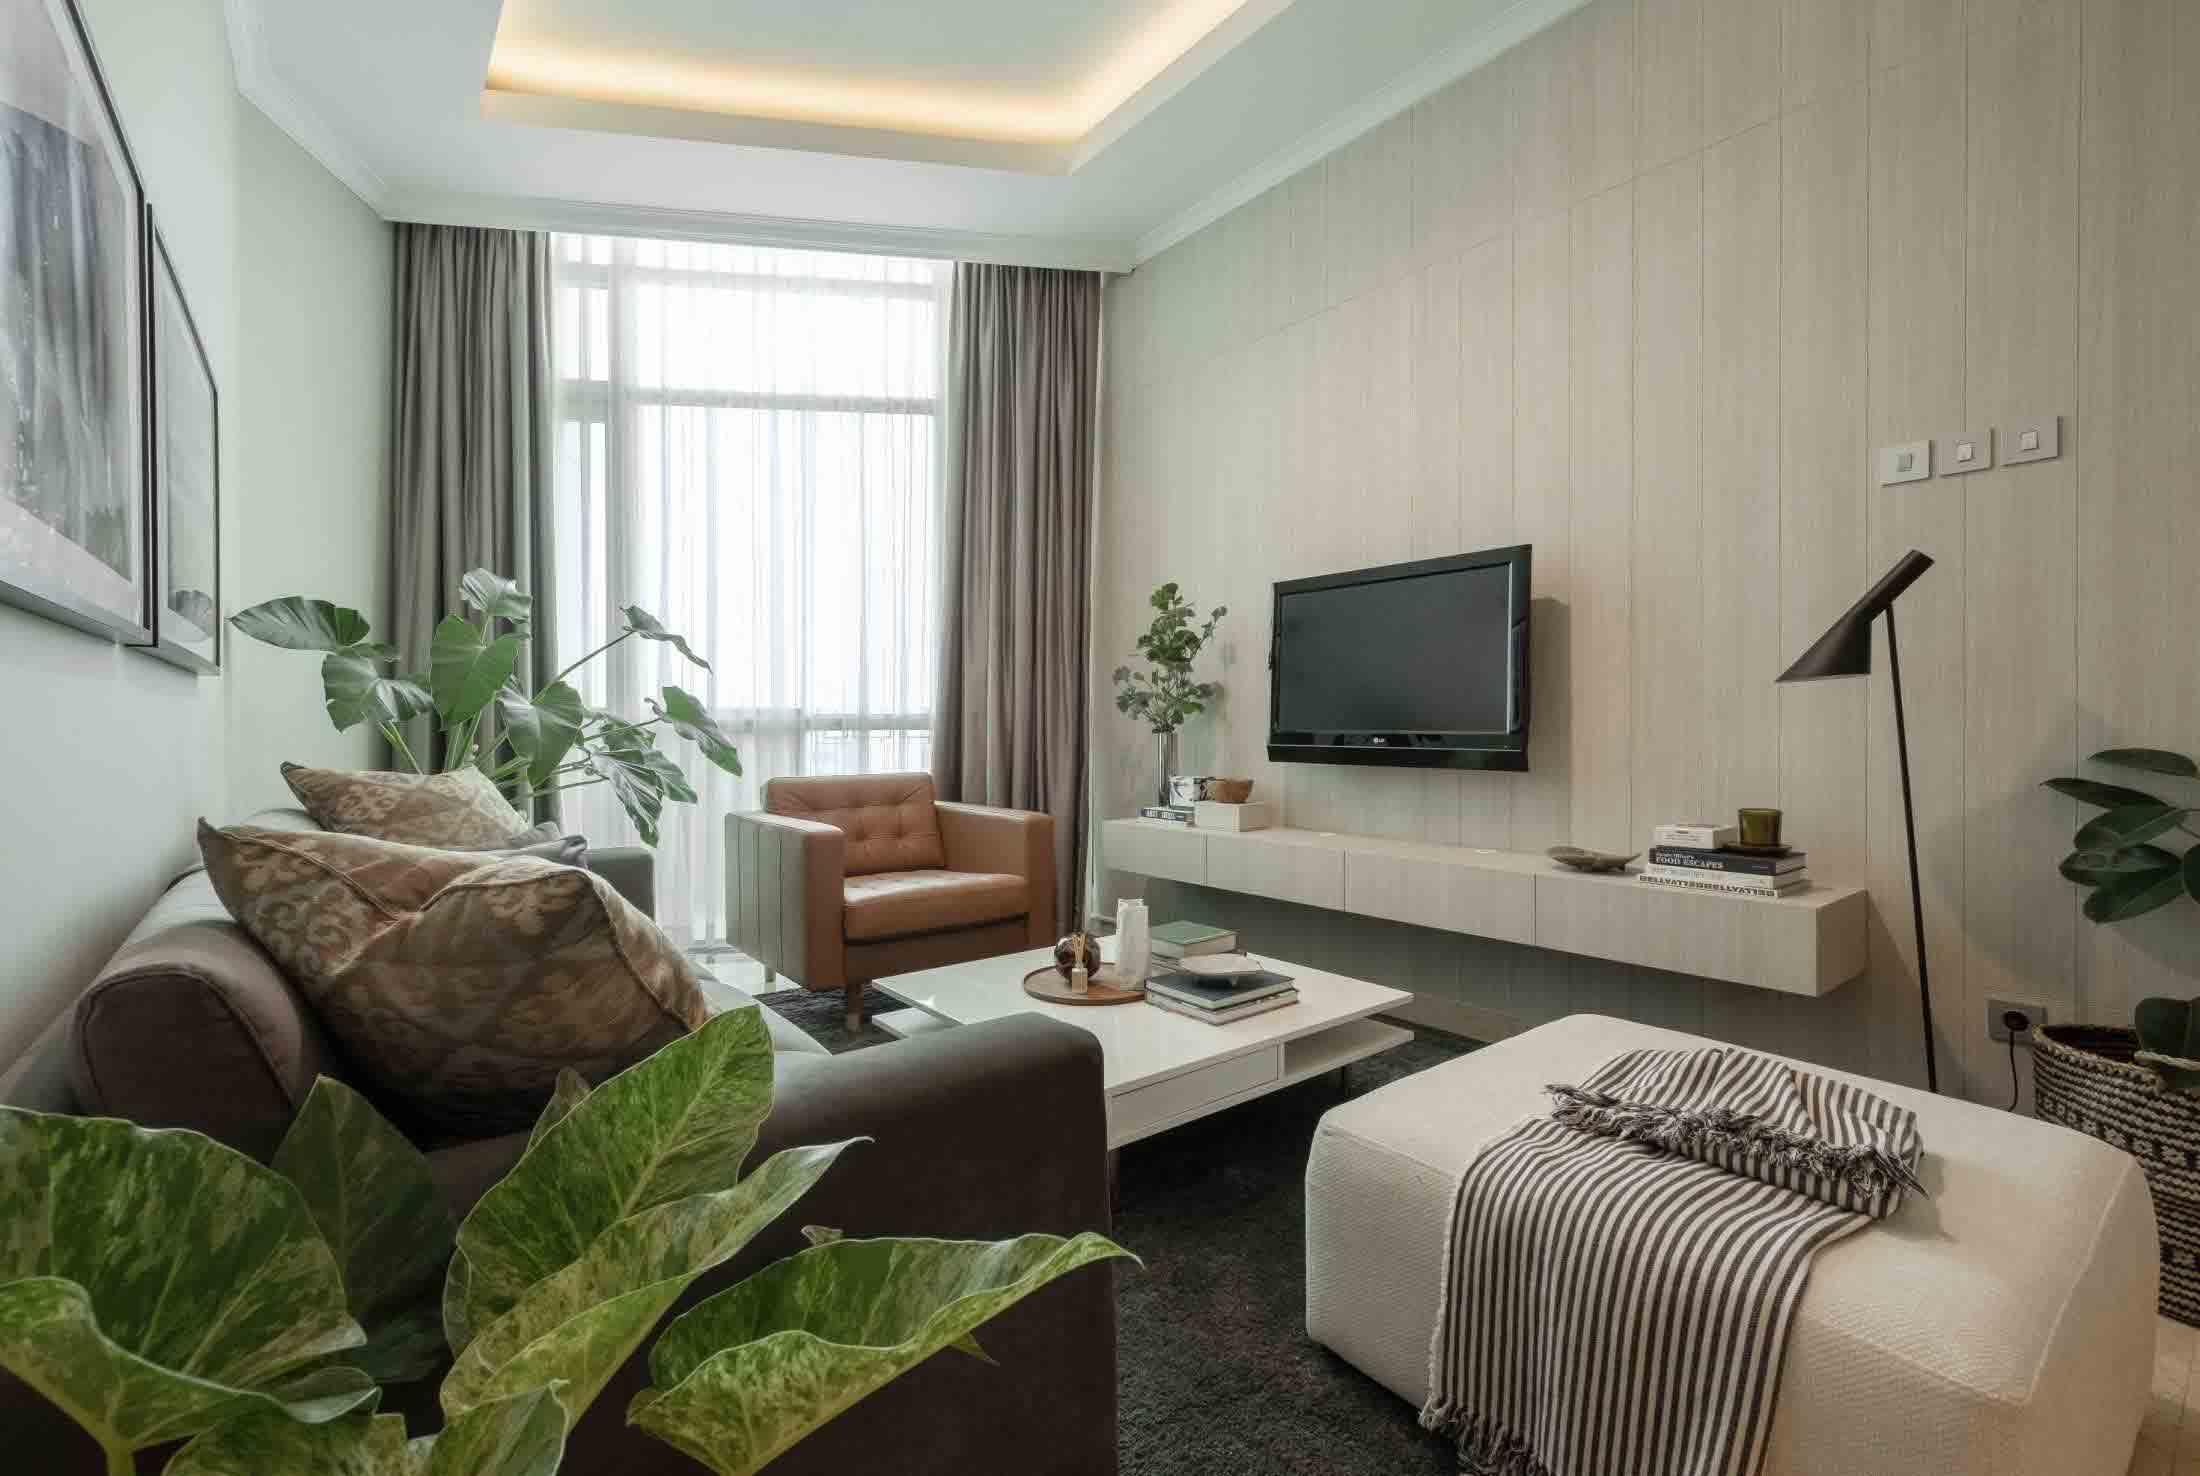 Desain Interior Apartemen Minimalis Super Cantik Dan Elegan Ala Makai Design Company Arsitag